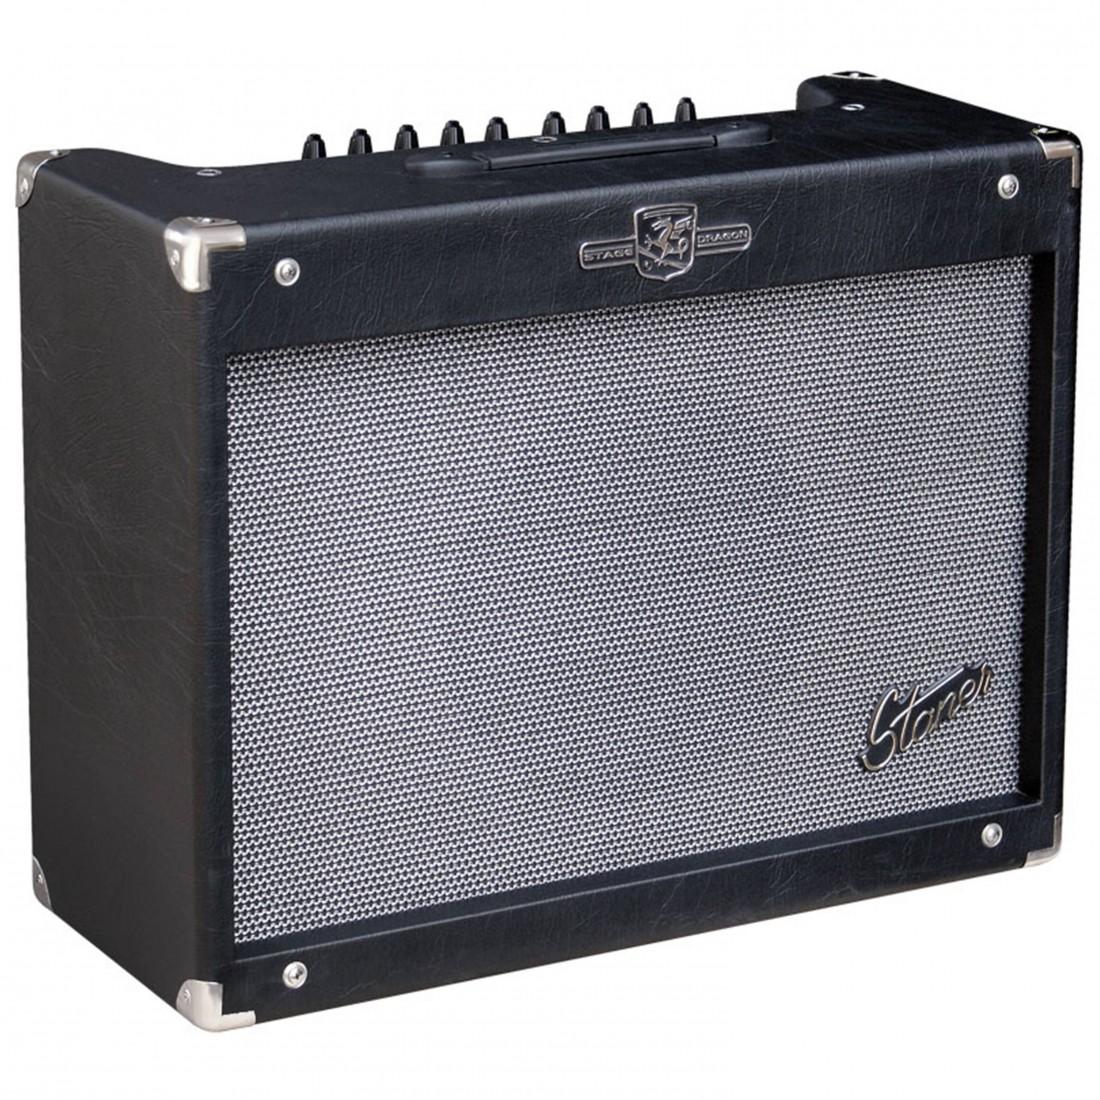 Imagem do produto Caixa Amplificada Guitarra Staner 12 polegadas 200 watts GT-212